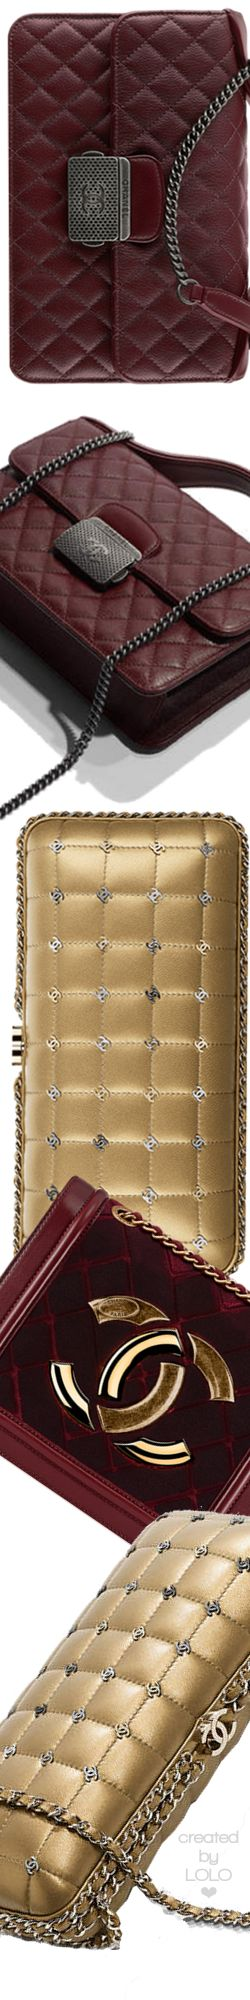 Chanel Fall/Winter 2016/17 Bags | LOLO❤︎